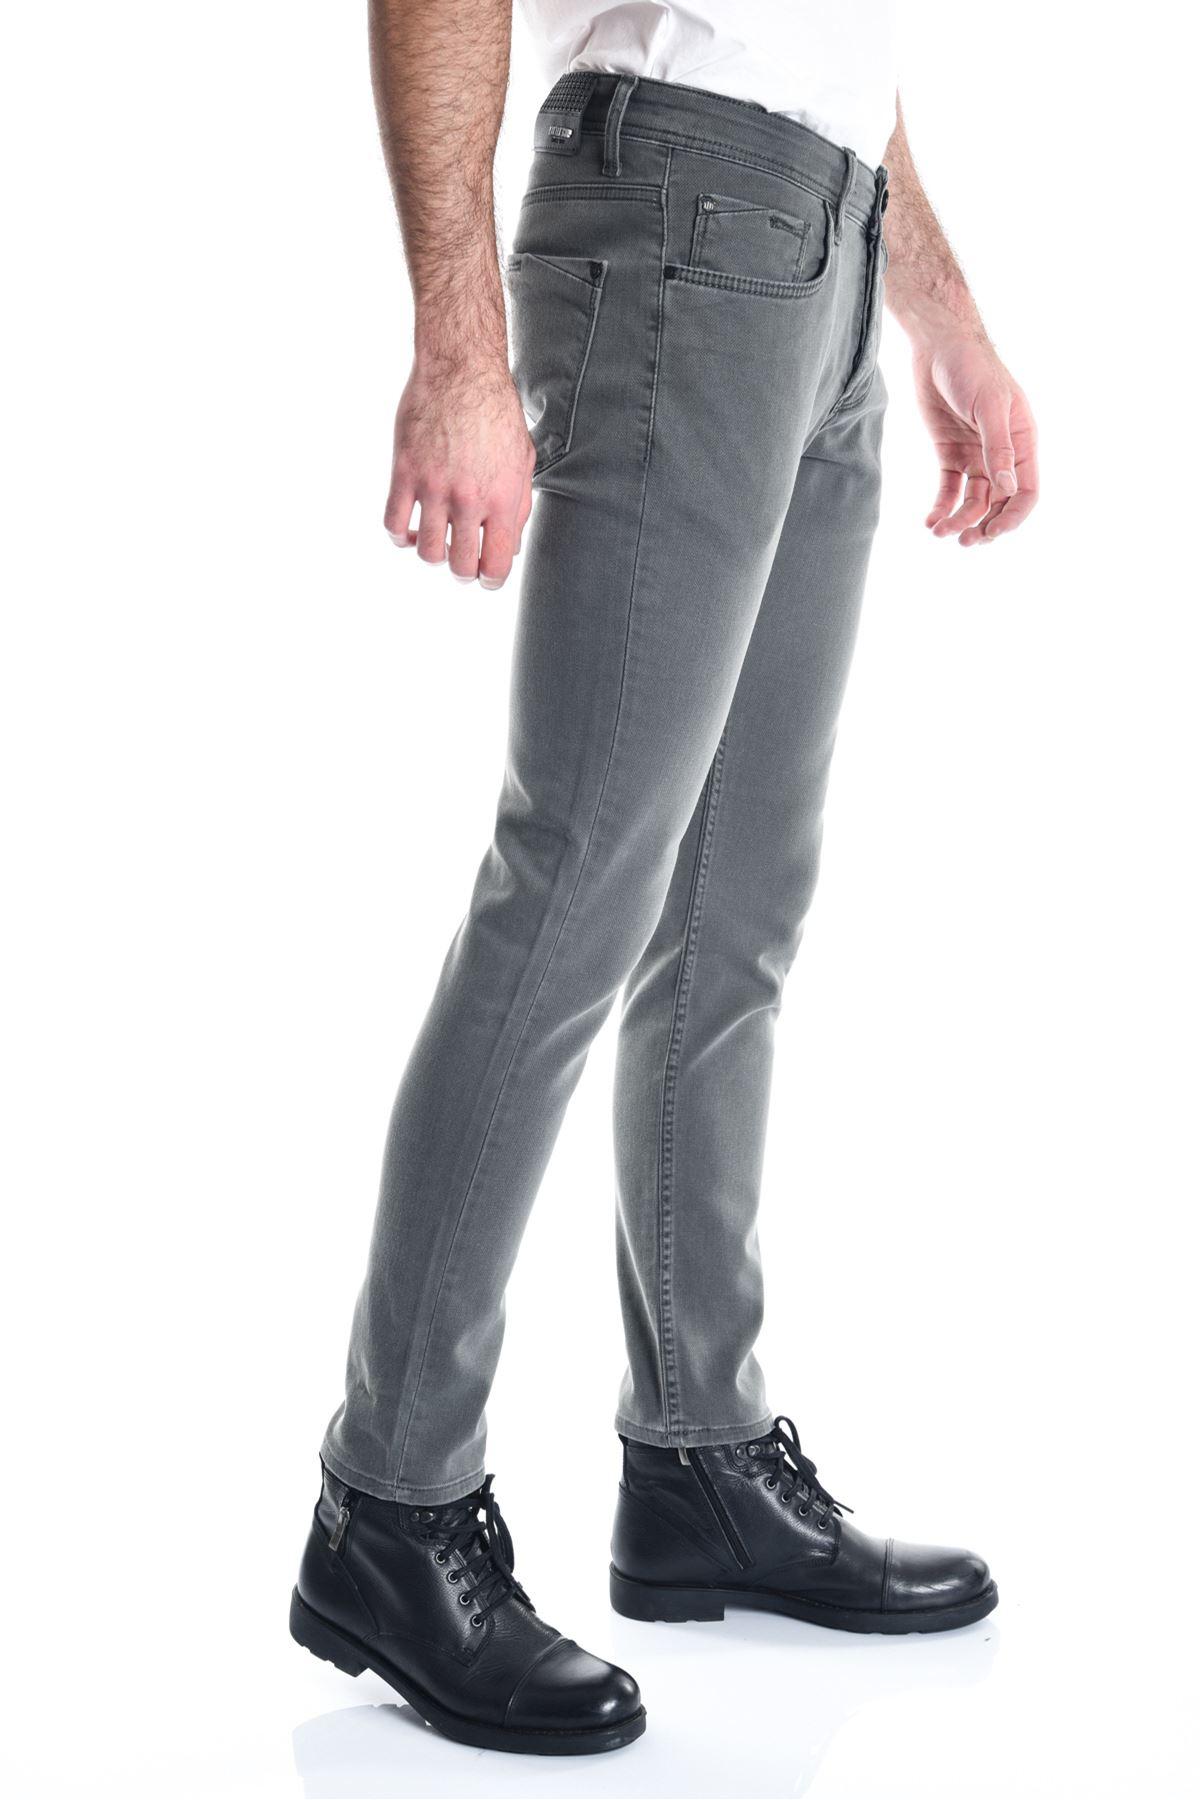 Haki Sade Örme Slimfit Erkek Kot Pantolon